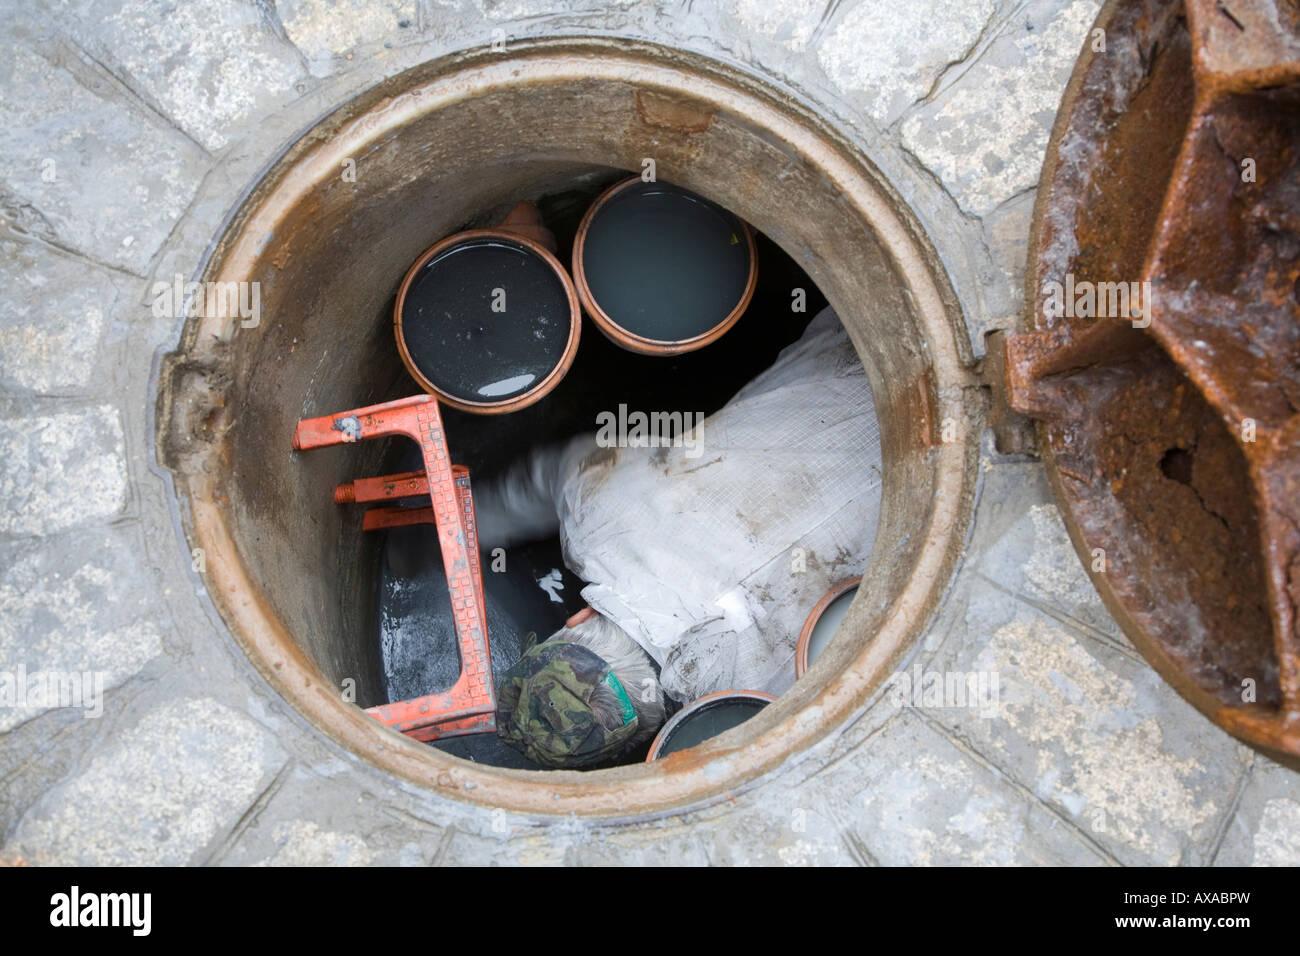 Sewer worker inside a manhole seville spain stock photo